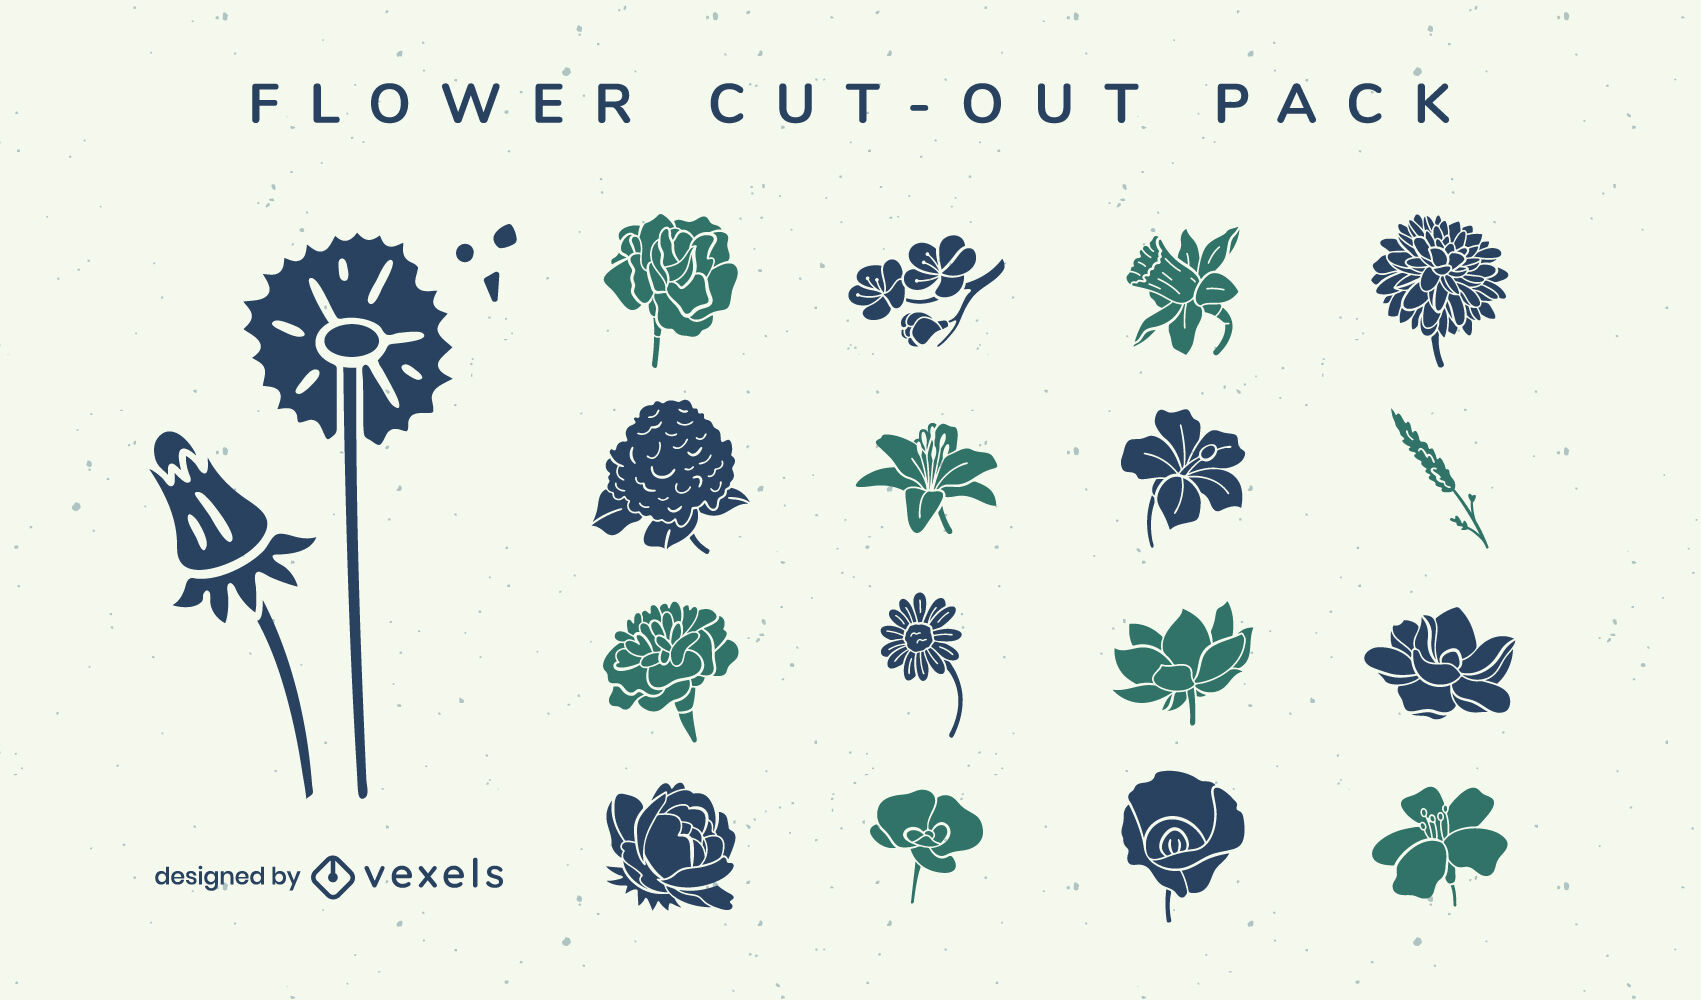 Blumengartenpflanzen Natur Ausschnittpackung